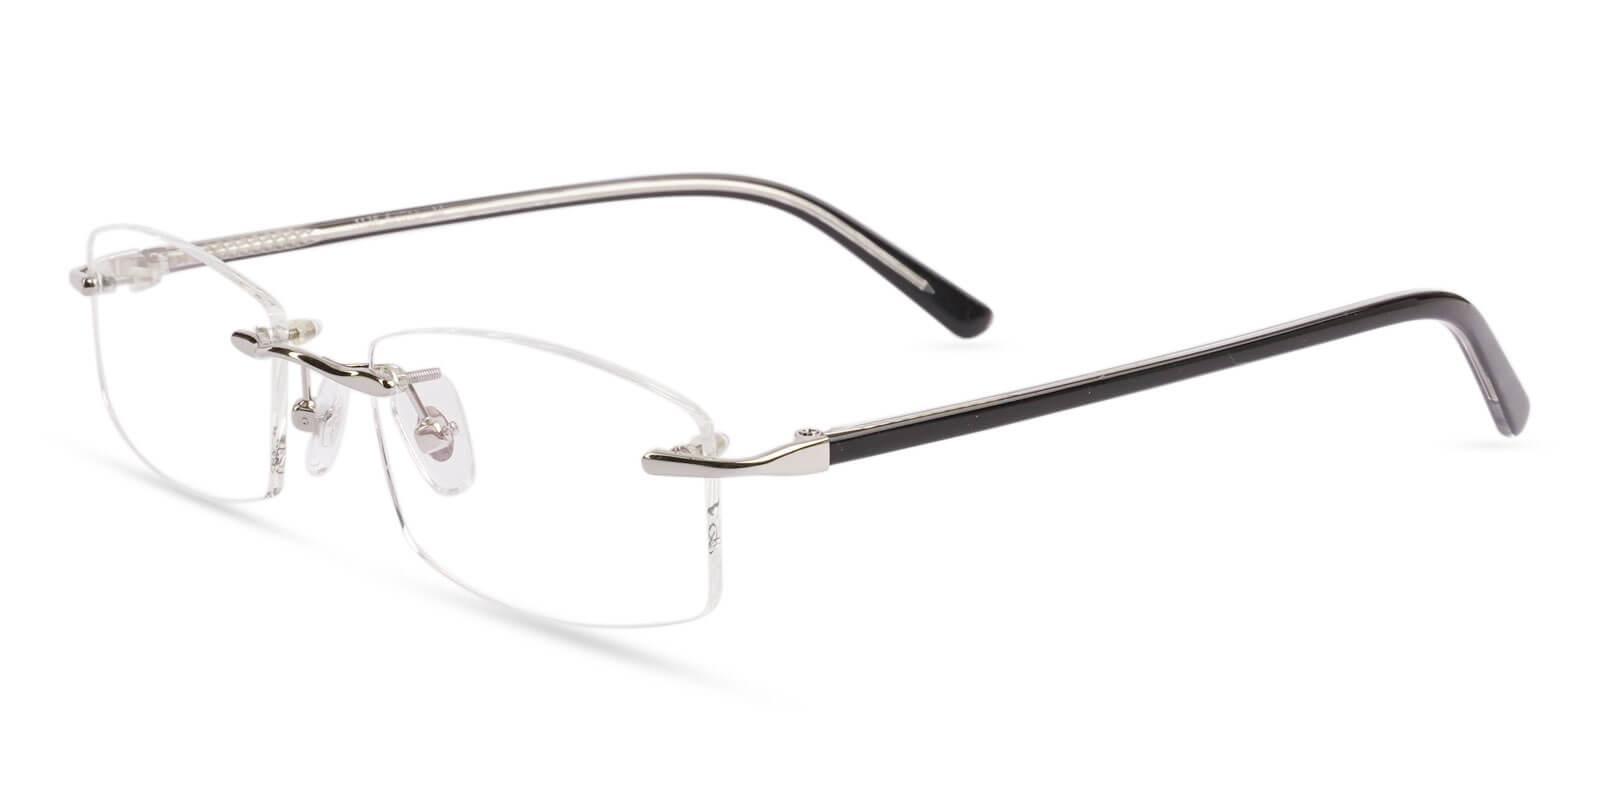 Lucas Silver Metal Eyeglasses , NosePads Frames from ABBE Glasses